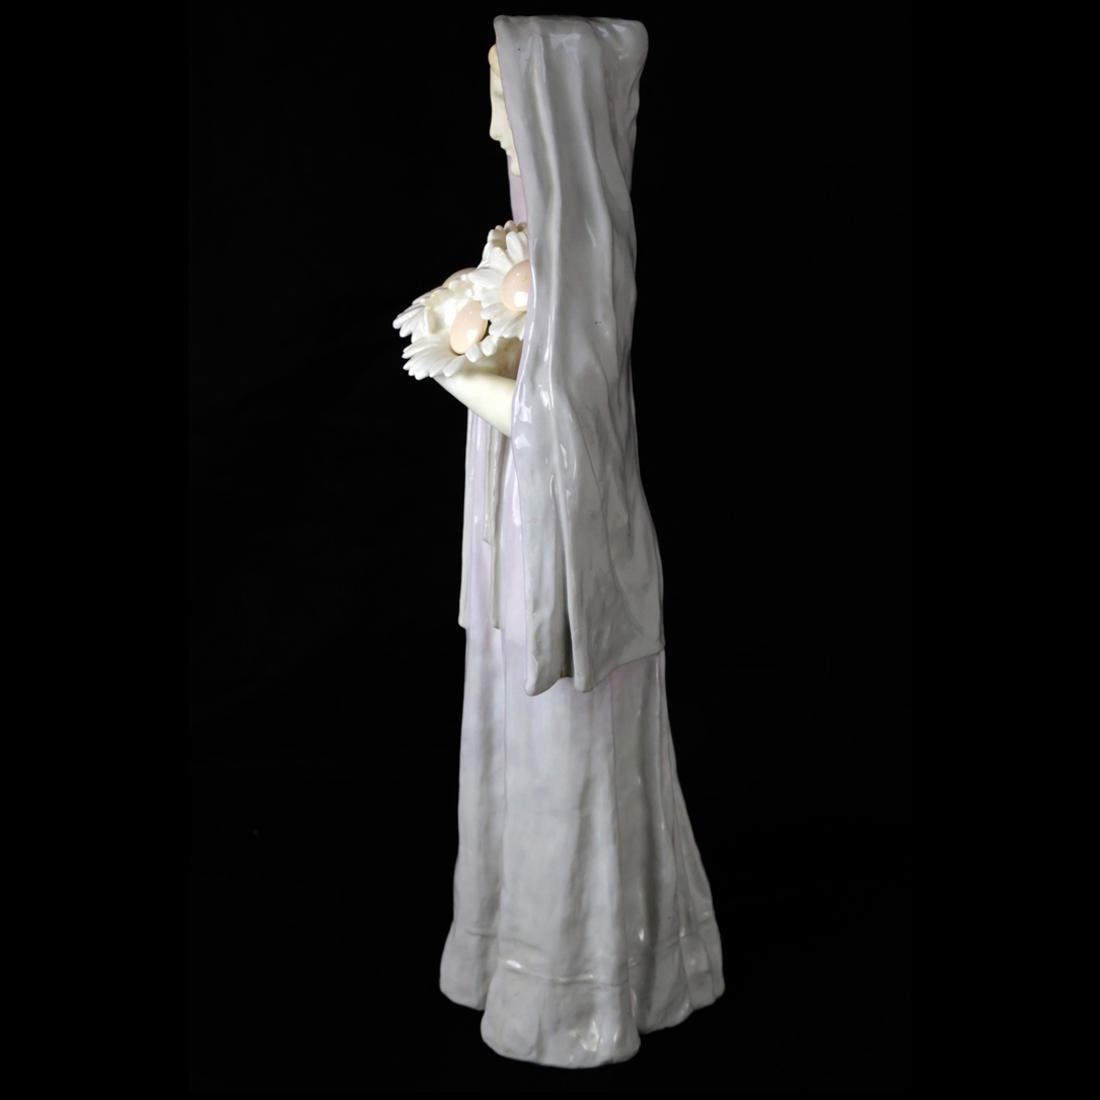 Impressive Ernest Borsdorf Sculpture - 6